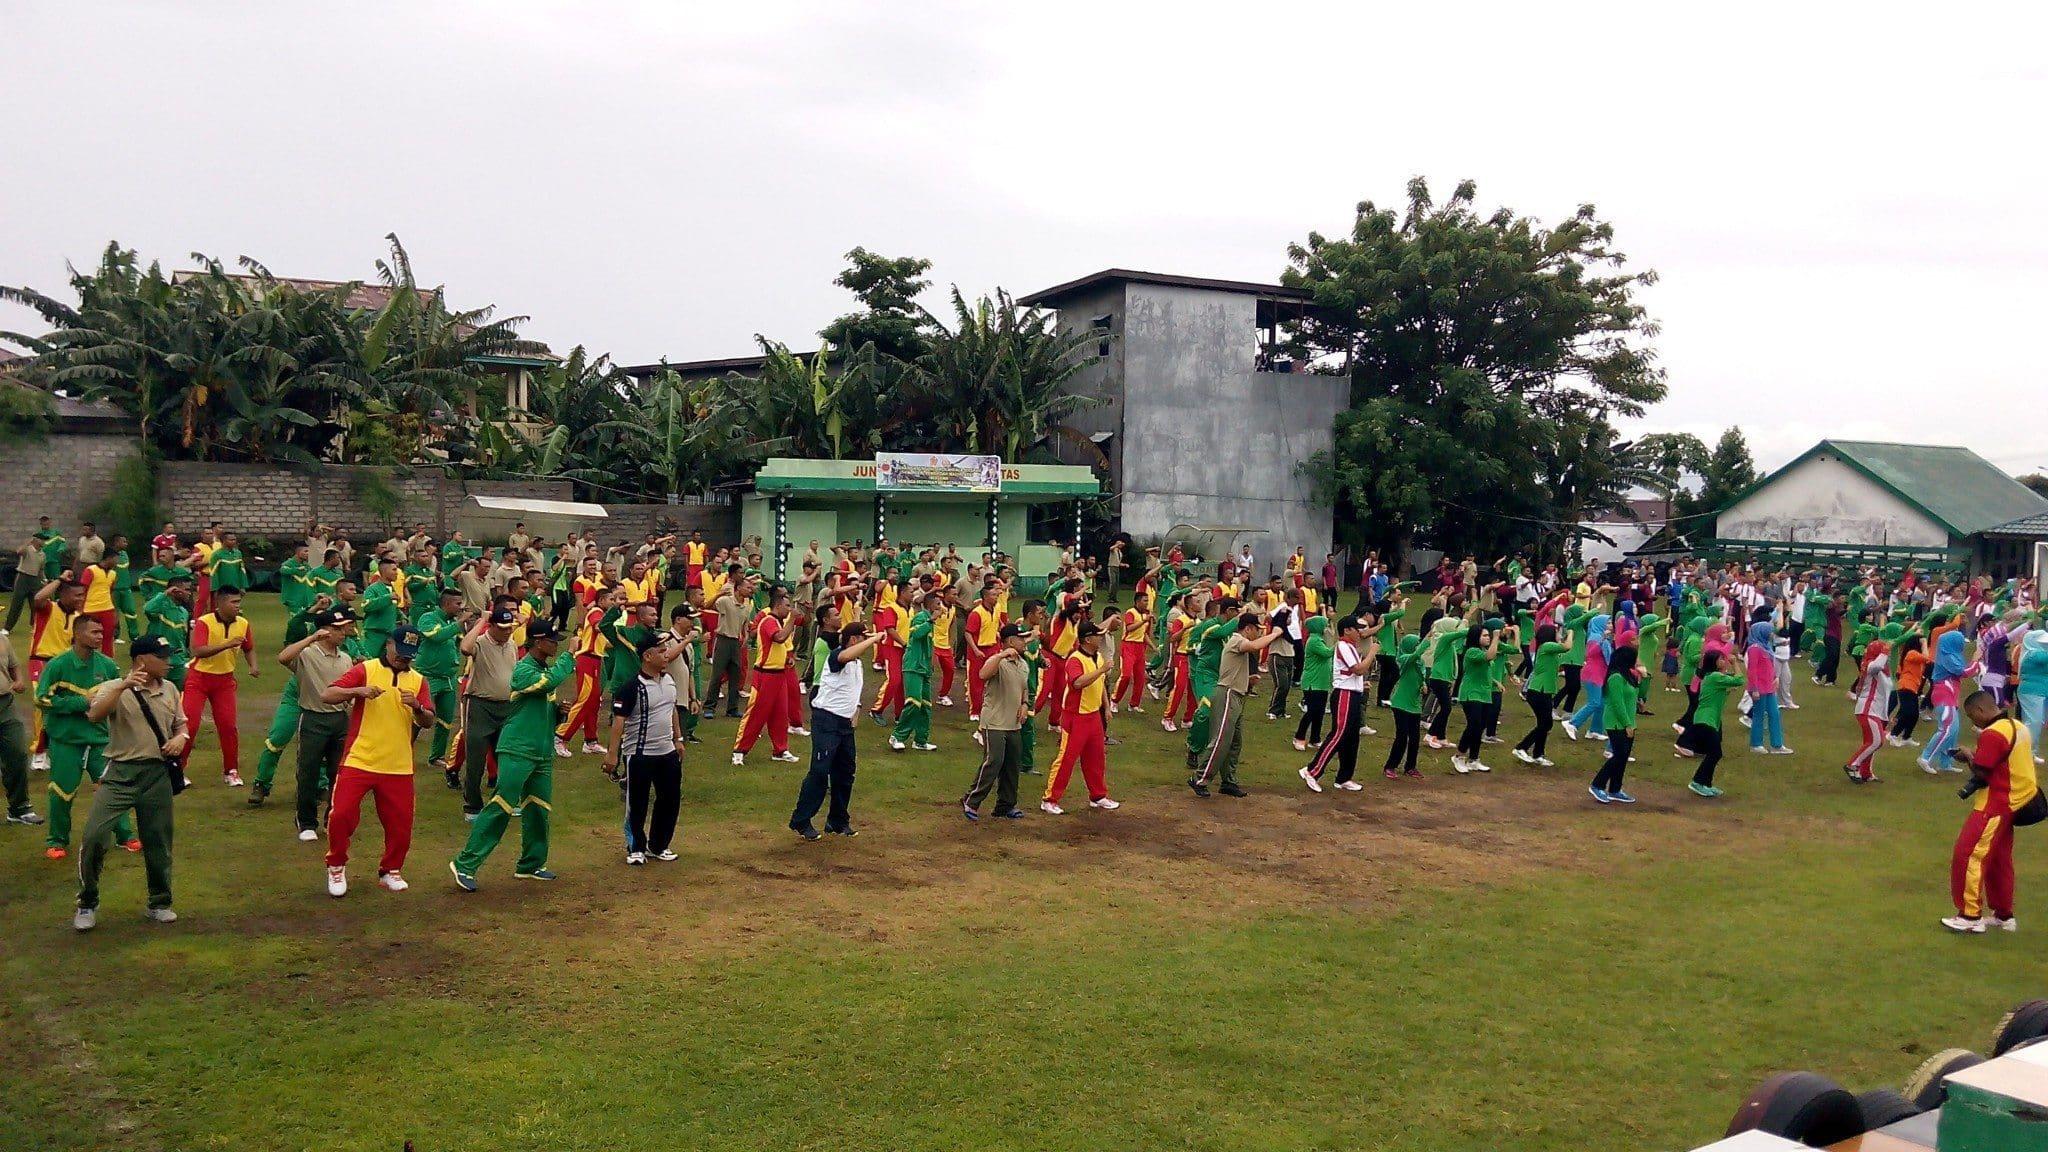 Tingkatkan Soliditas TNI/Polri, Korem 152/Bbl gelar Olahraga bersama